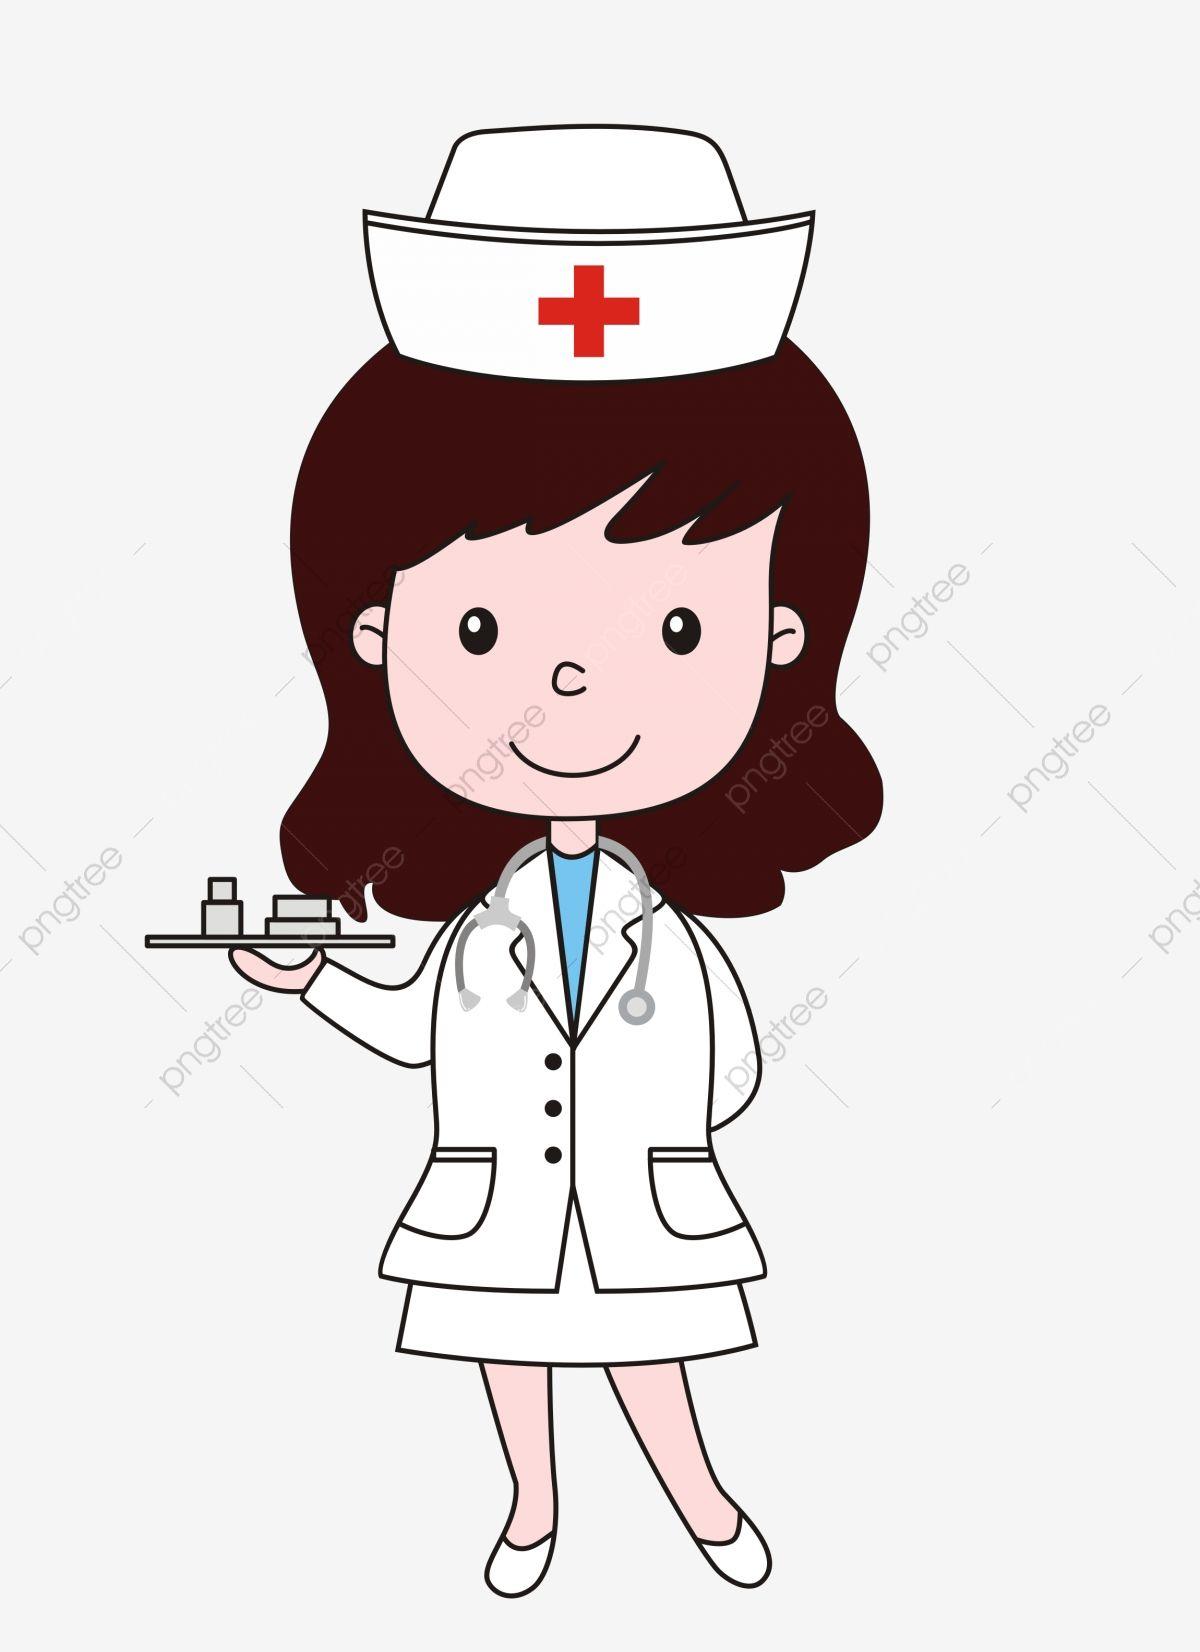 Vector Illustration Pink Nurse Hat Vector Illustration Pink Cross Png Transparent Clipart Image And Psd File For Free Download Chapeu De Enfermeira Ilustracoes Vetoriais Ilustracao Vetorial